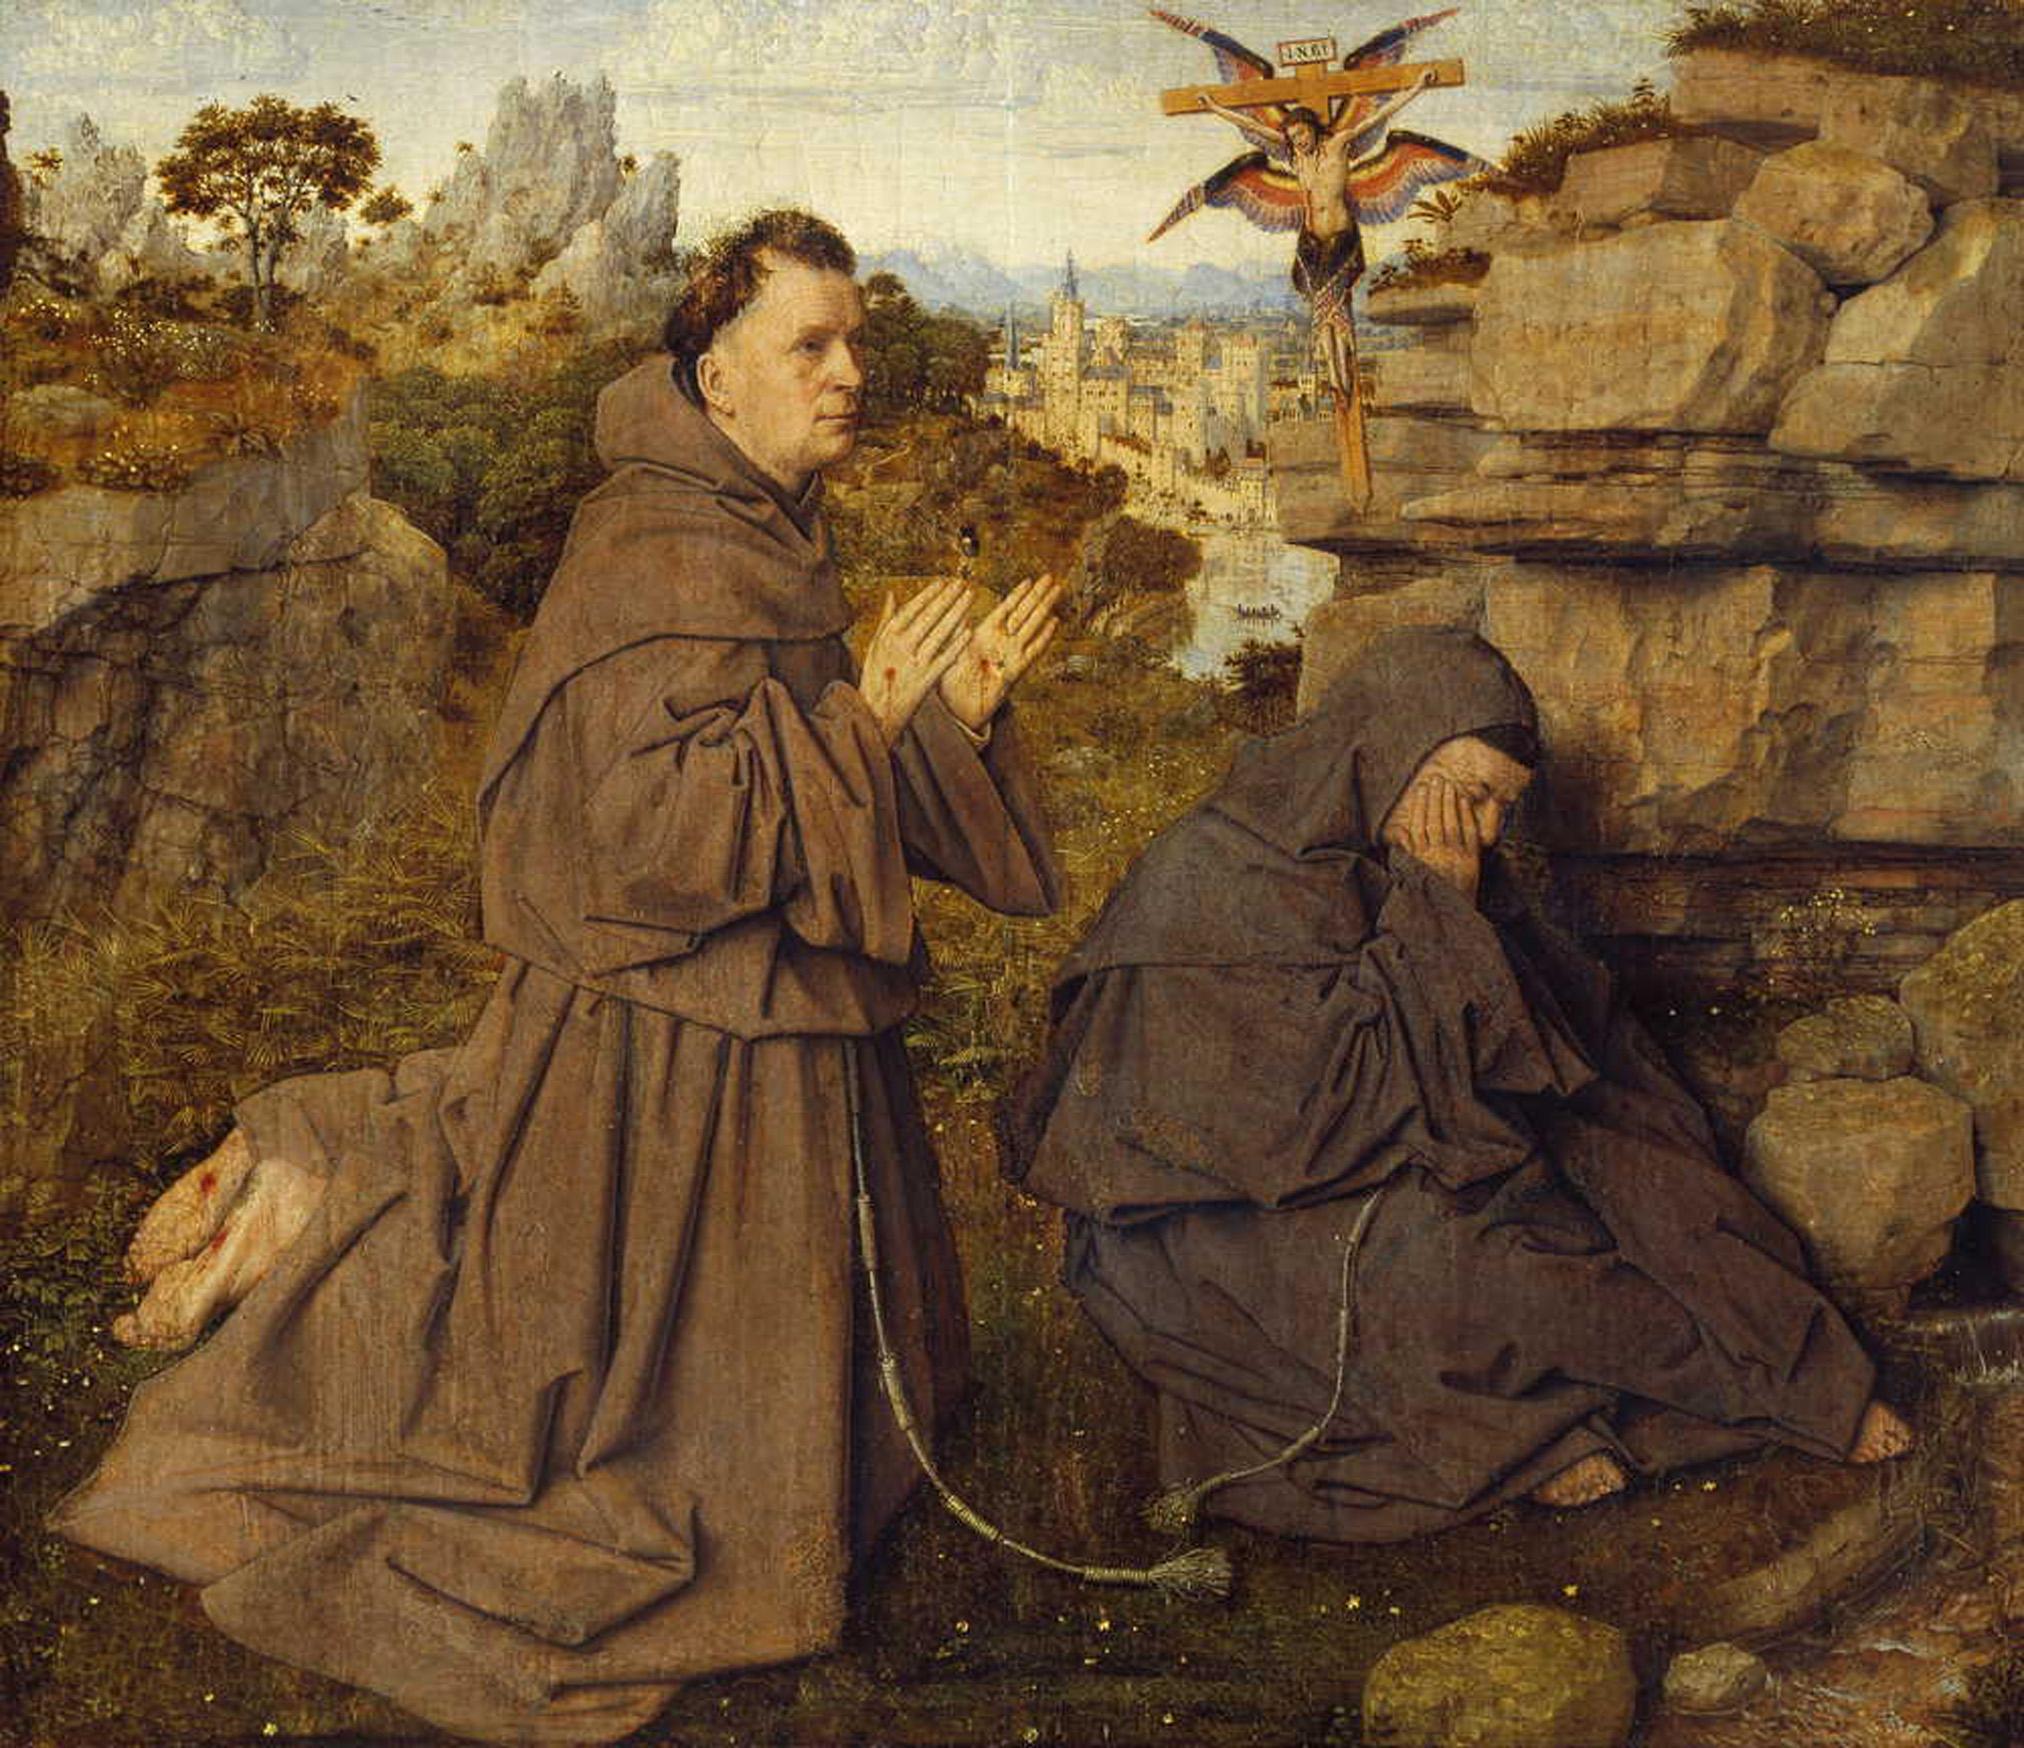 File:Stimmate-San-Francesco-TO-Van-Eyck.jpg - Wikimedia Commons